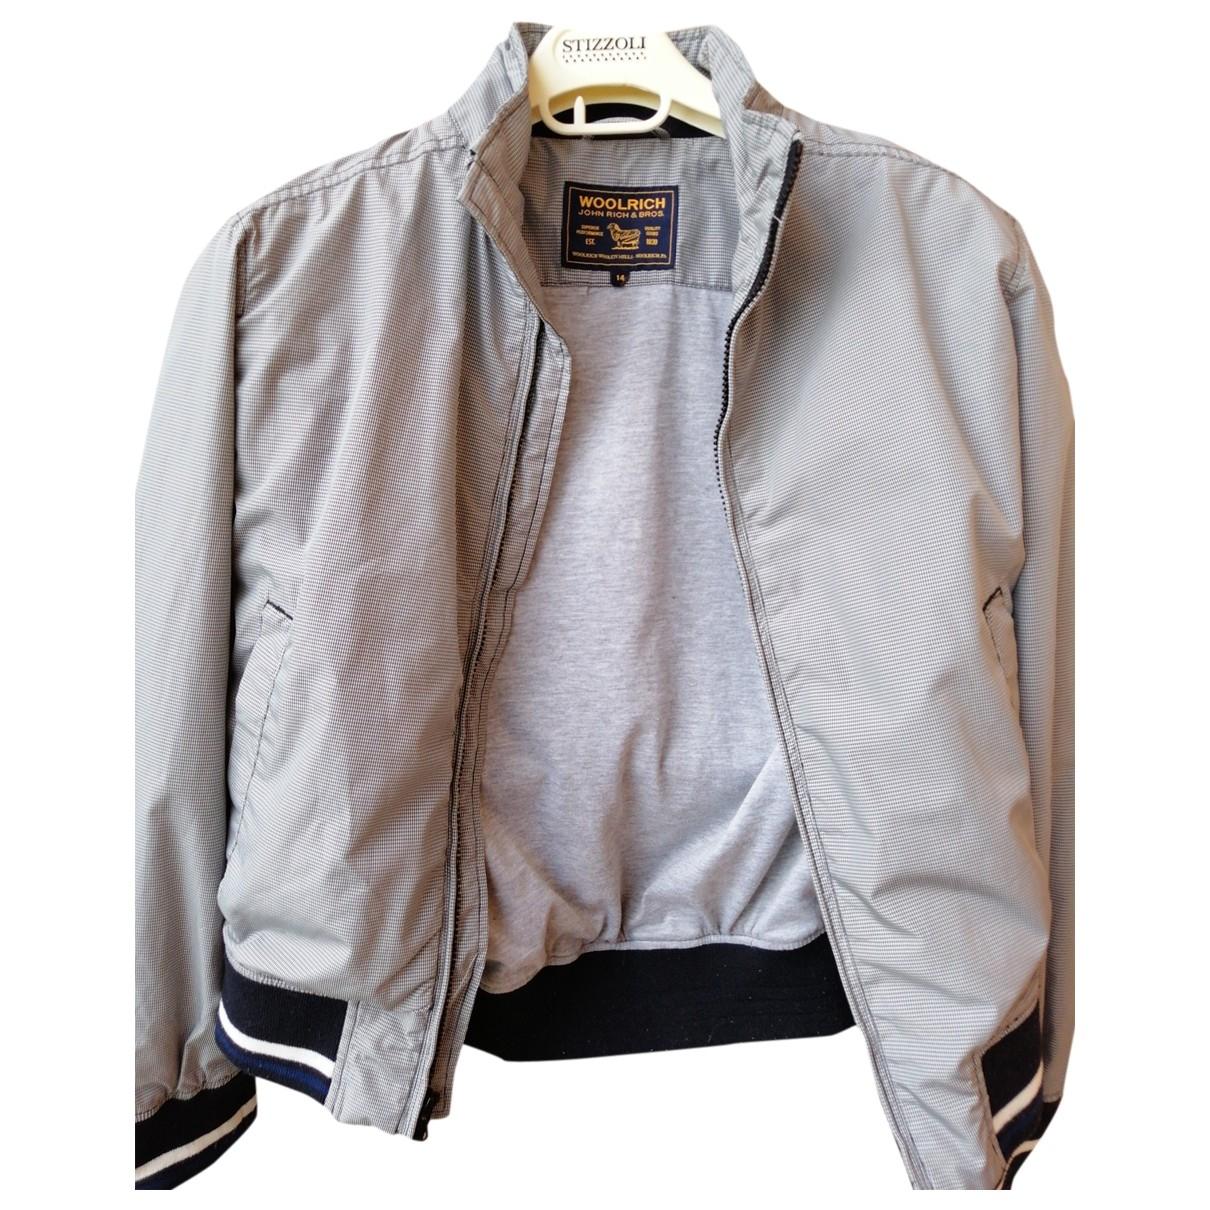 Woolrich \N Multicolour jacket & coat for Kids 14 years - S FR